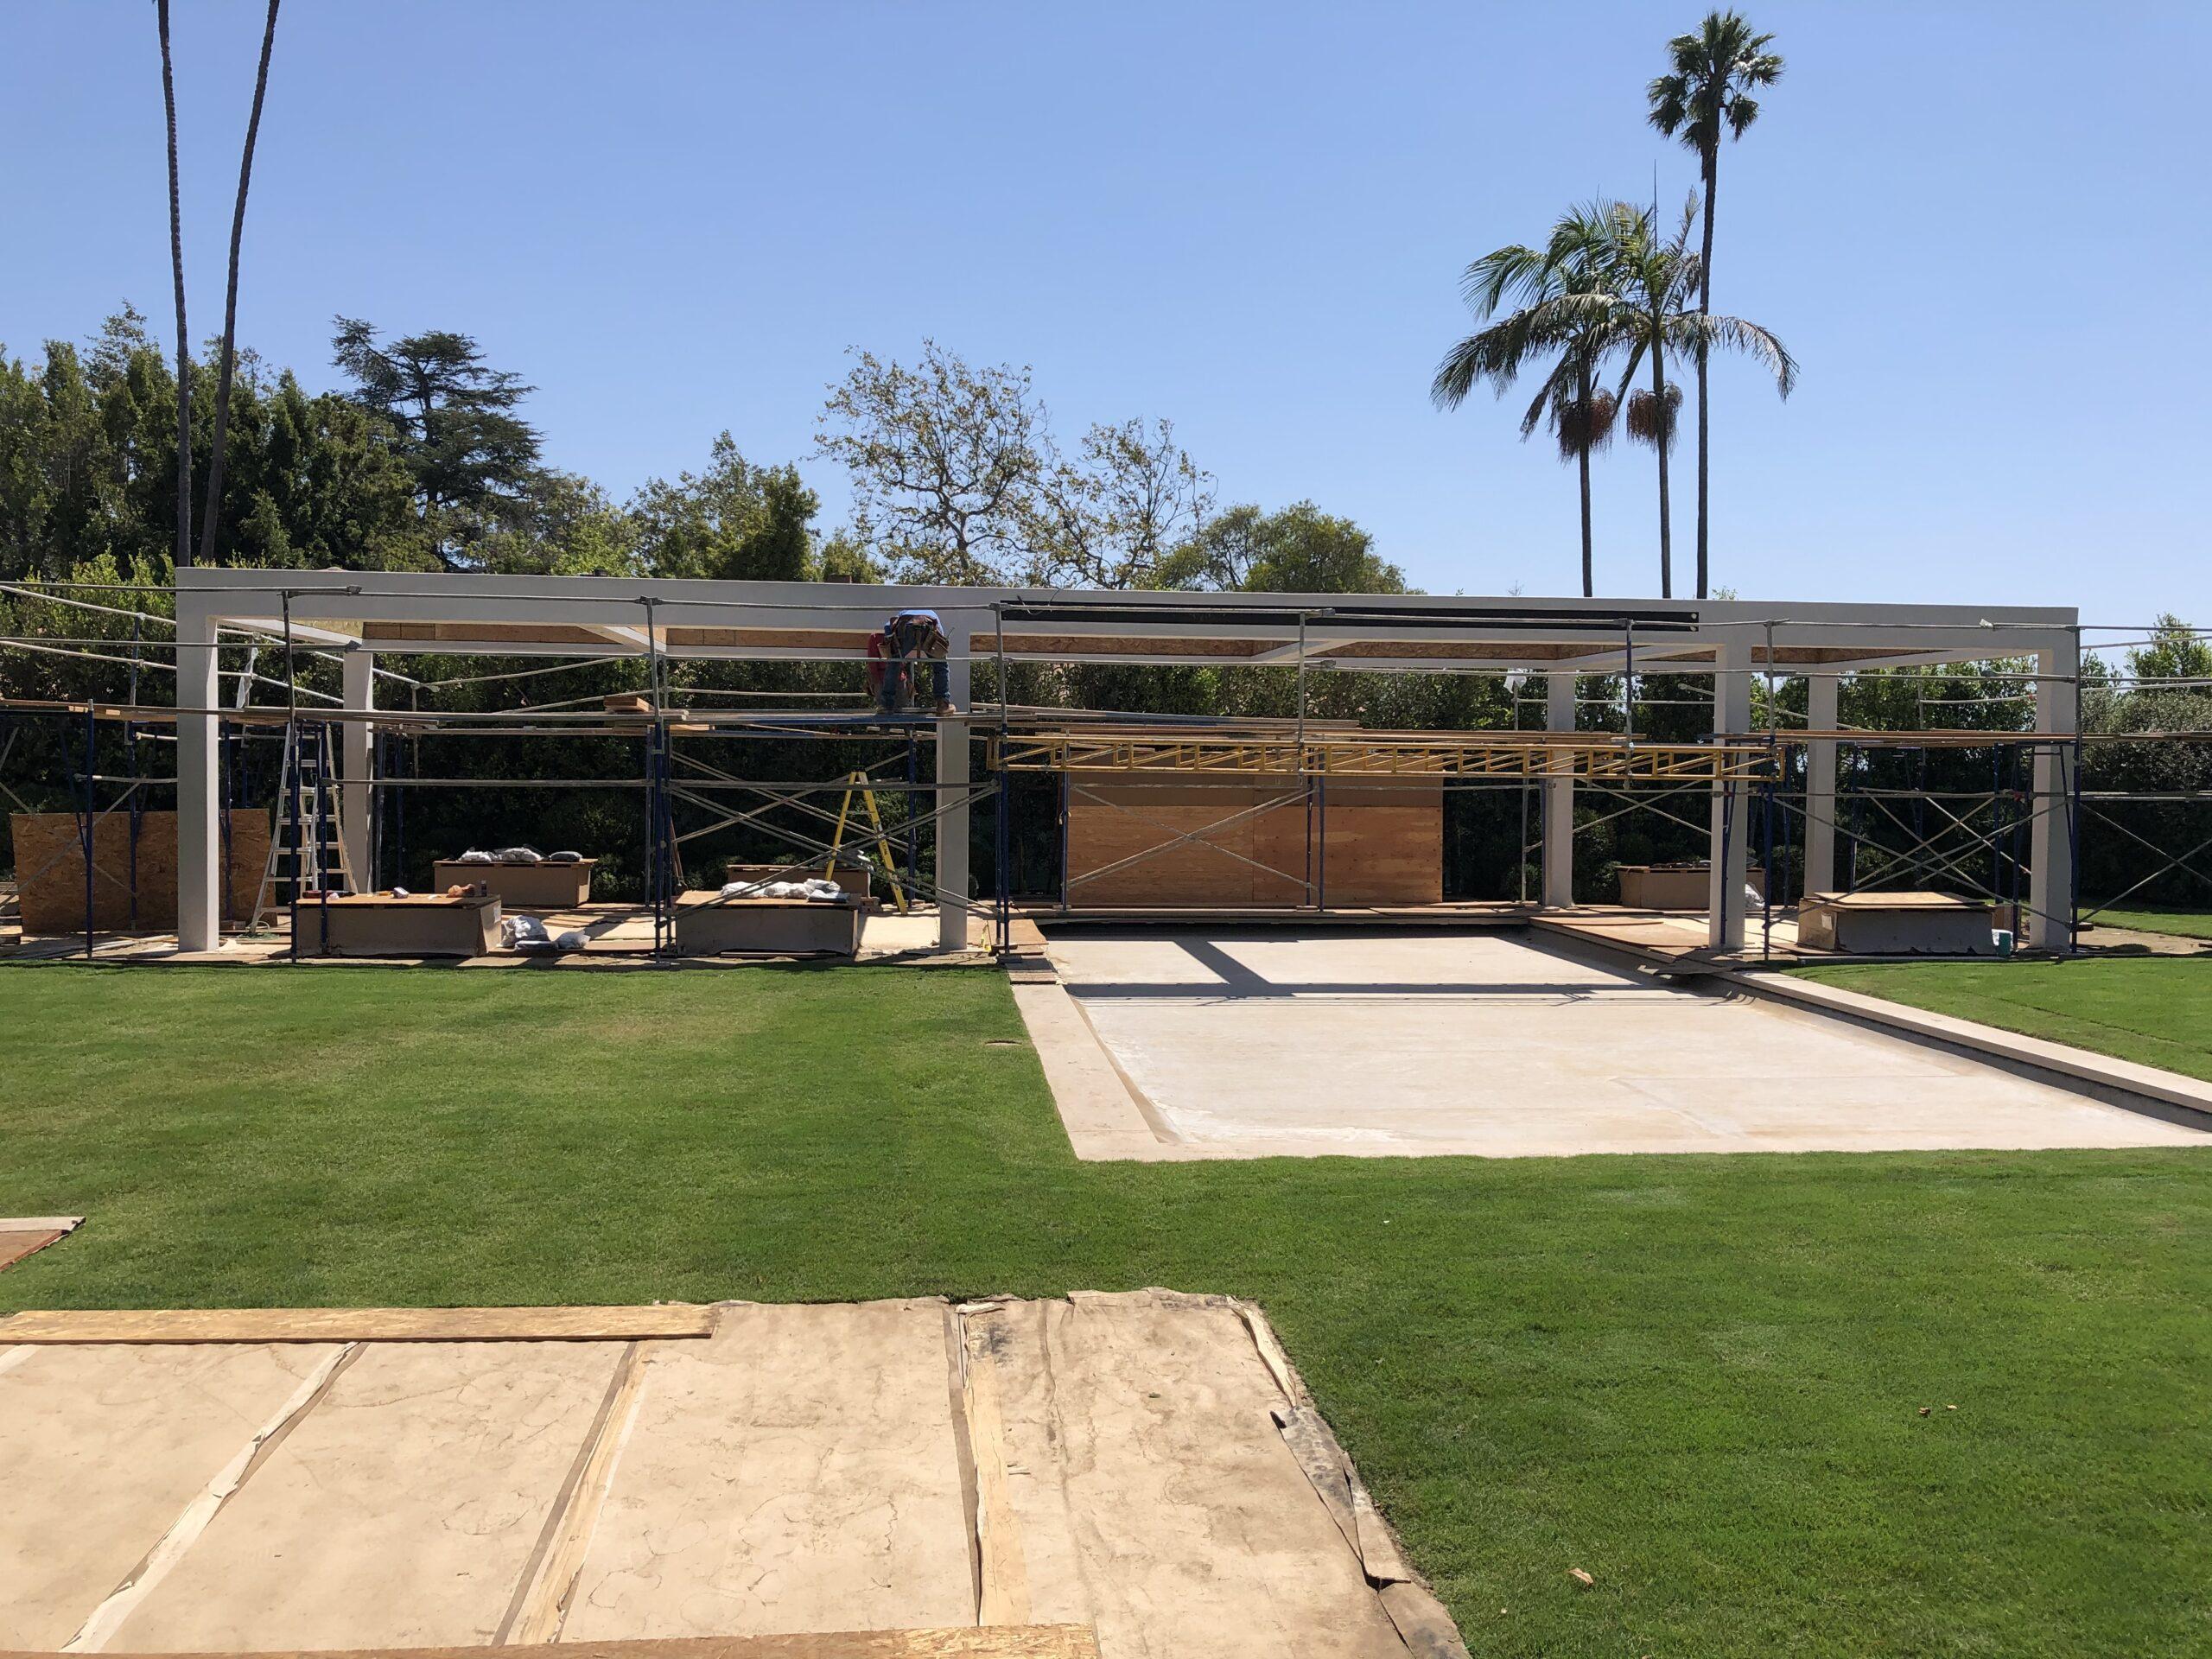 Villa Rockingham - Patio with five large slat louvers system